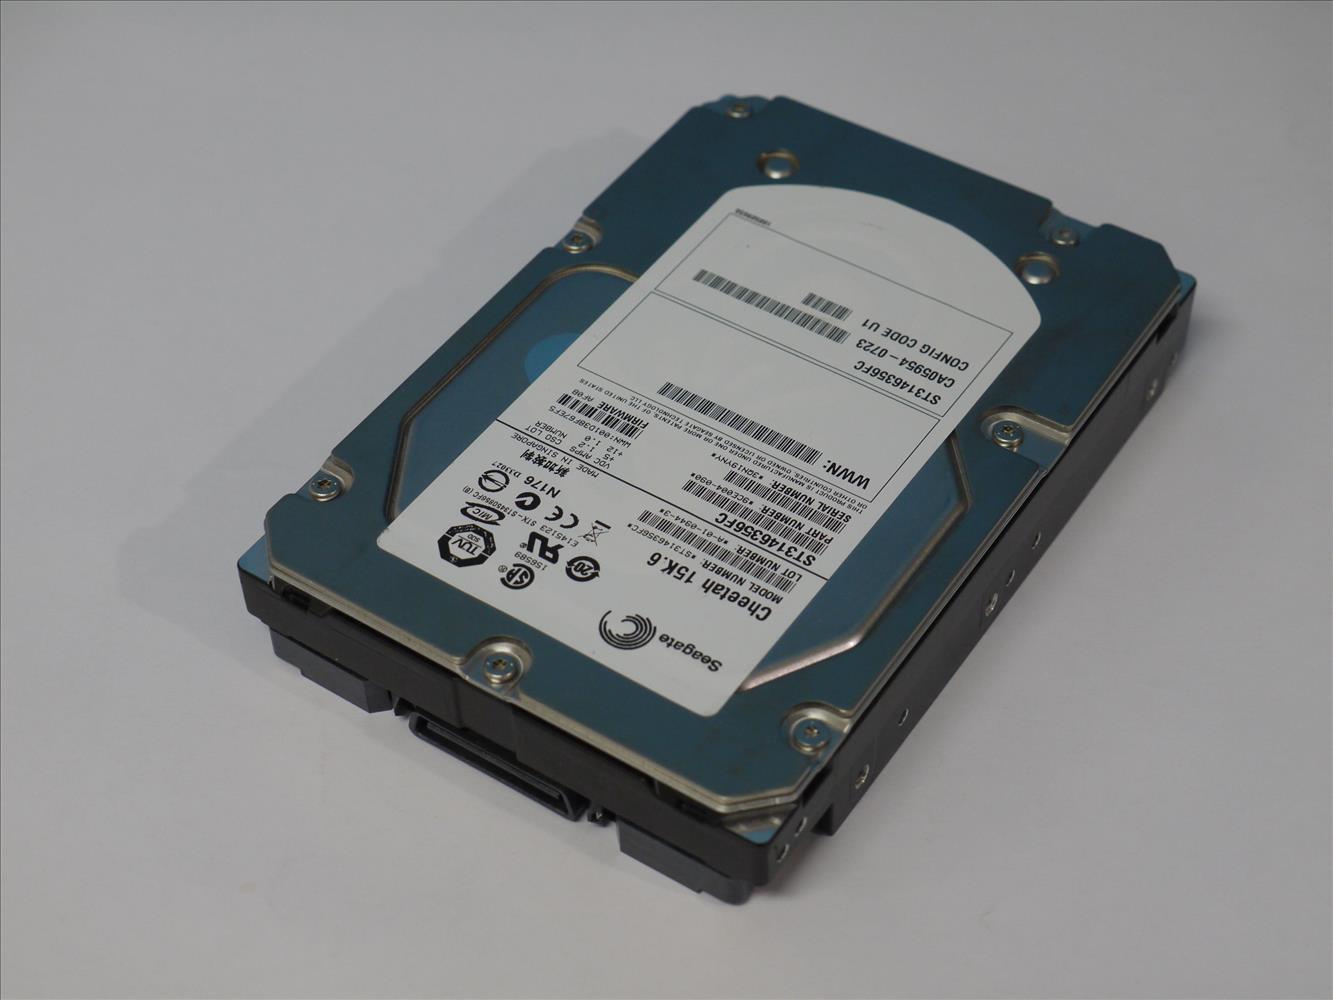 ST3146356FC SEAGATE 146GB 15000rpm 3.5インチ Fibre Channel 4 Gbps 【中古】【送料無料セール中! (大型商品は対象外)】